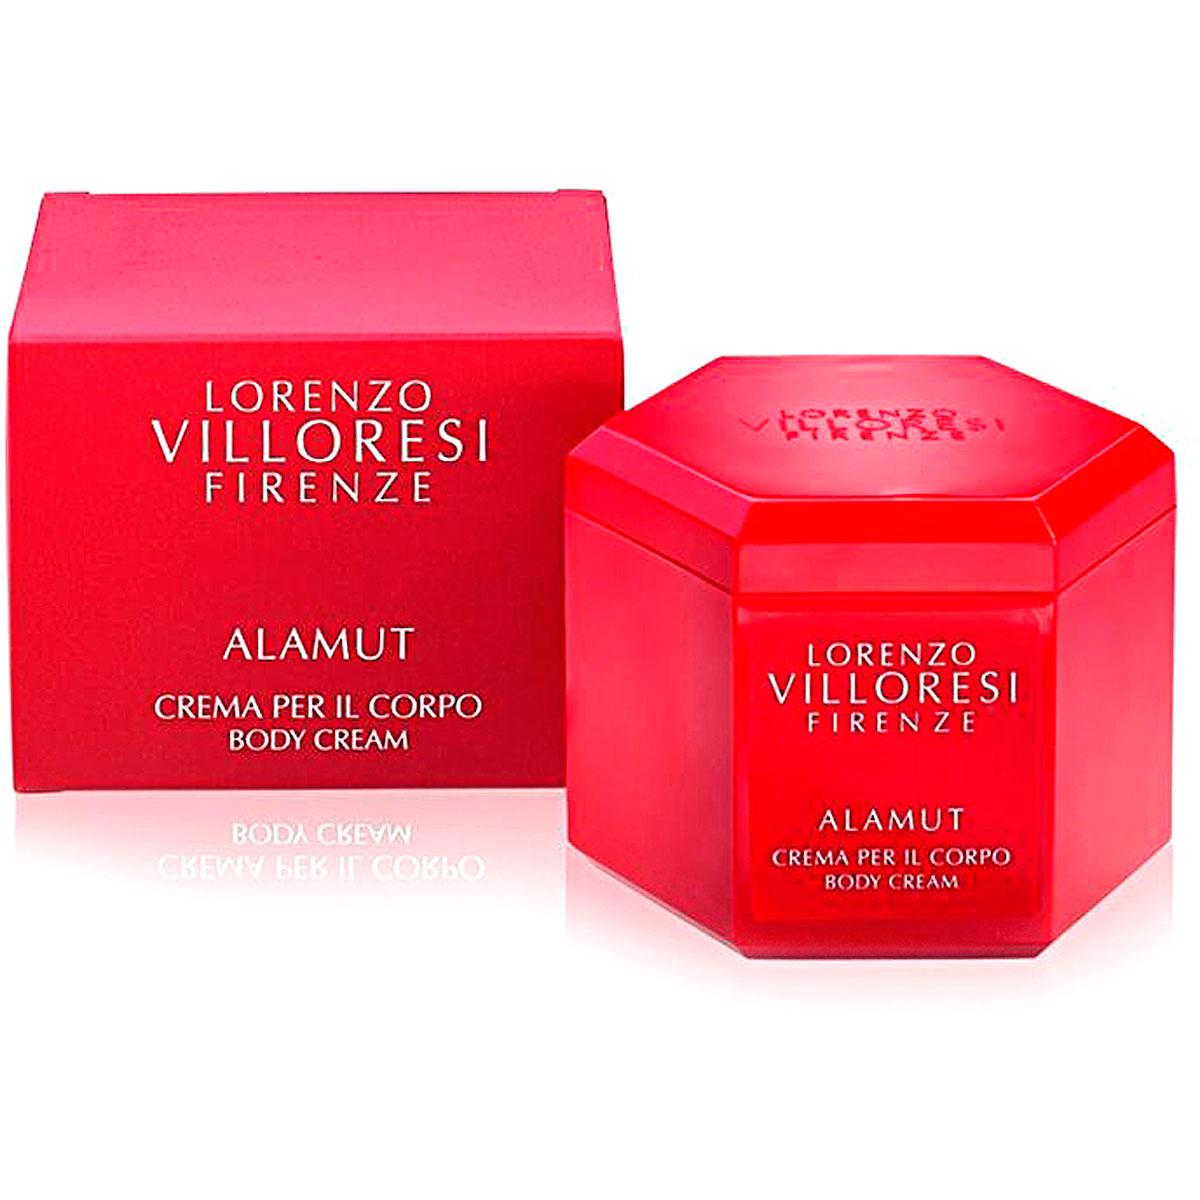 Lorenzo Villoresi Beauty for Men, Alamut - Body Cream - 200 Ml, 2019, 200 ml